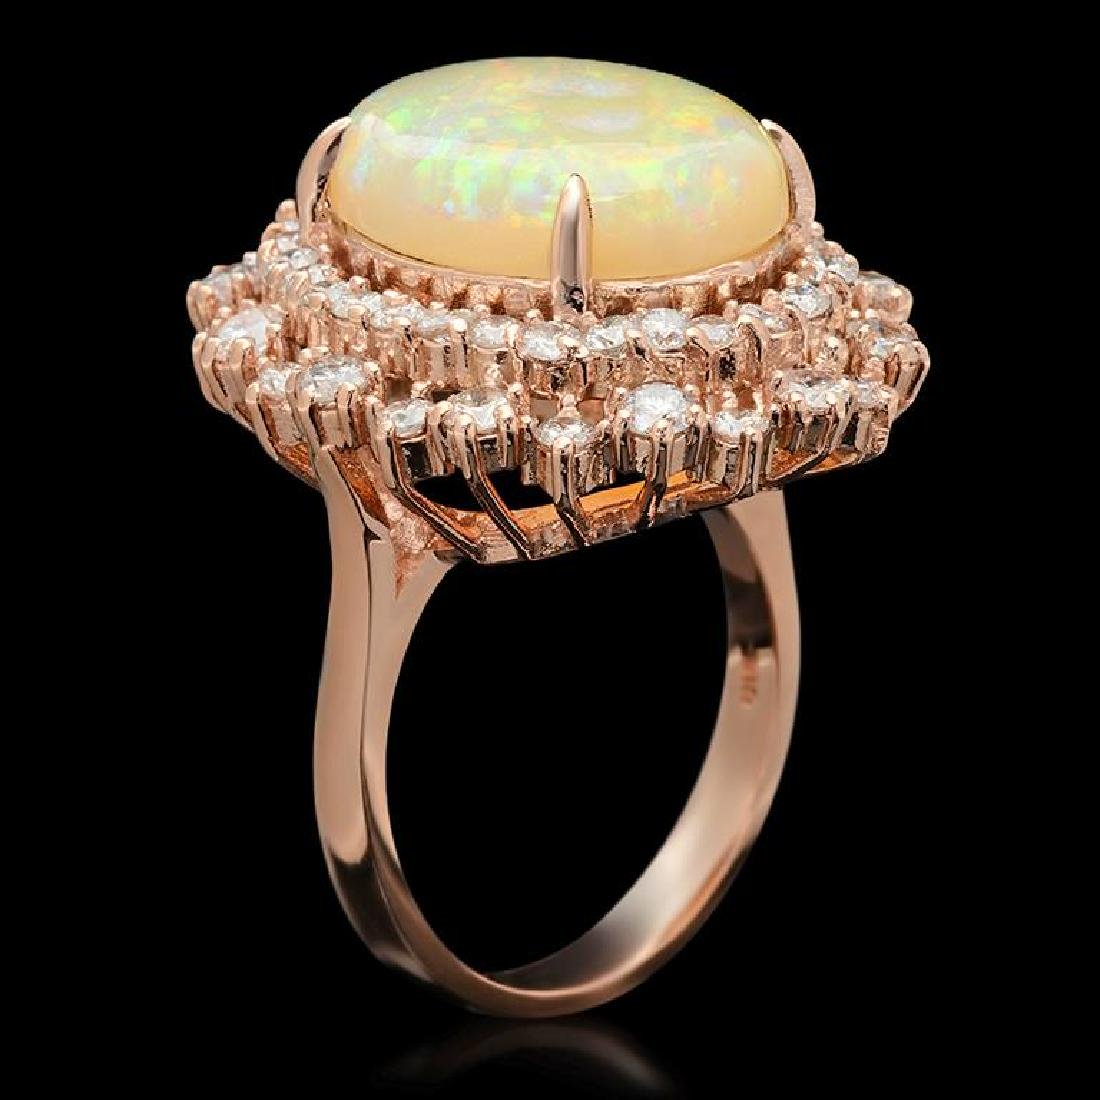 14K Gold 5.91ct Opal 1.85ct Diamond Ring - 2